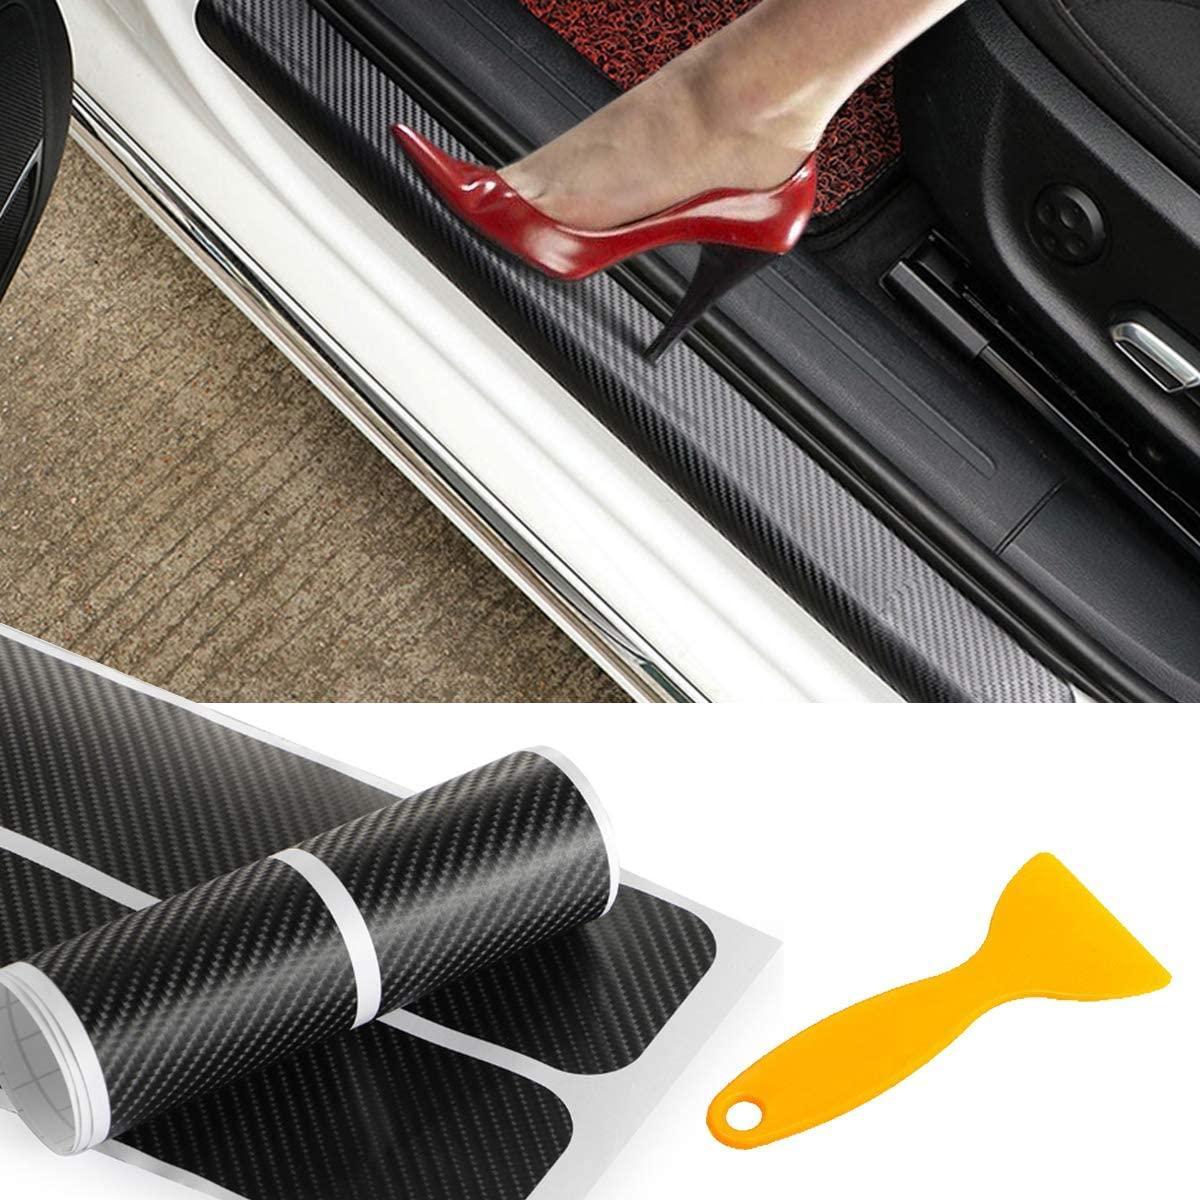 4 stücke Auto Türsteher Kohlefaser Aufkleber Tür Anti Kratzer Streifen Anti Kick Film Protec QC02